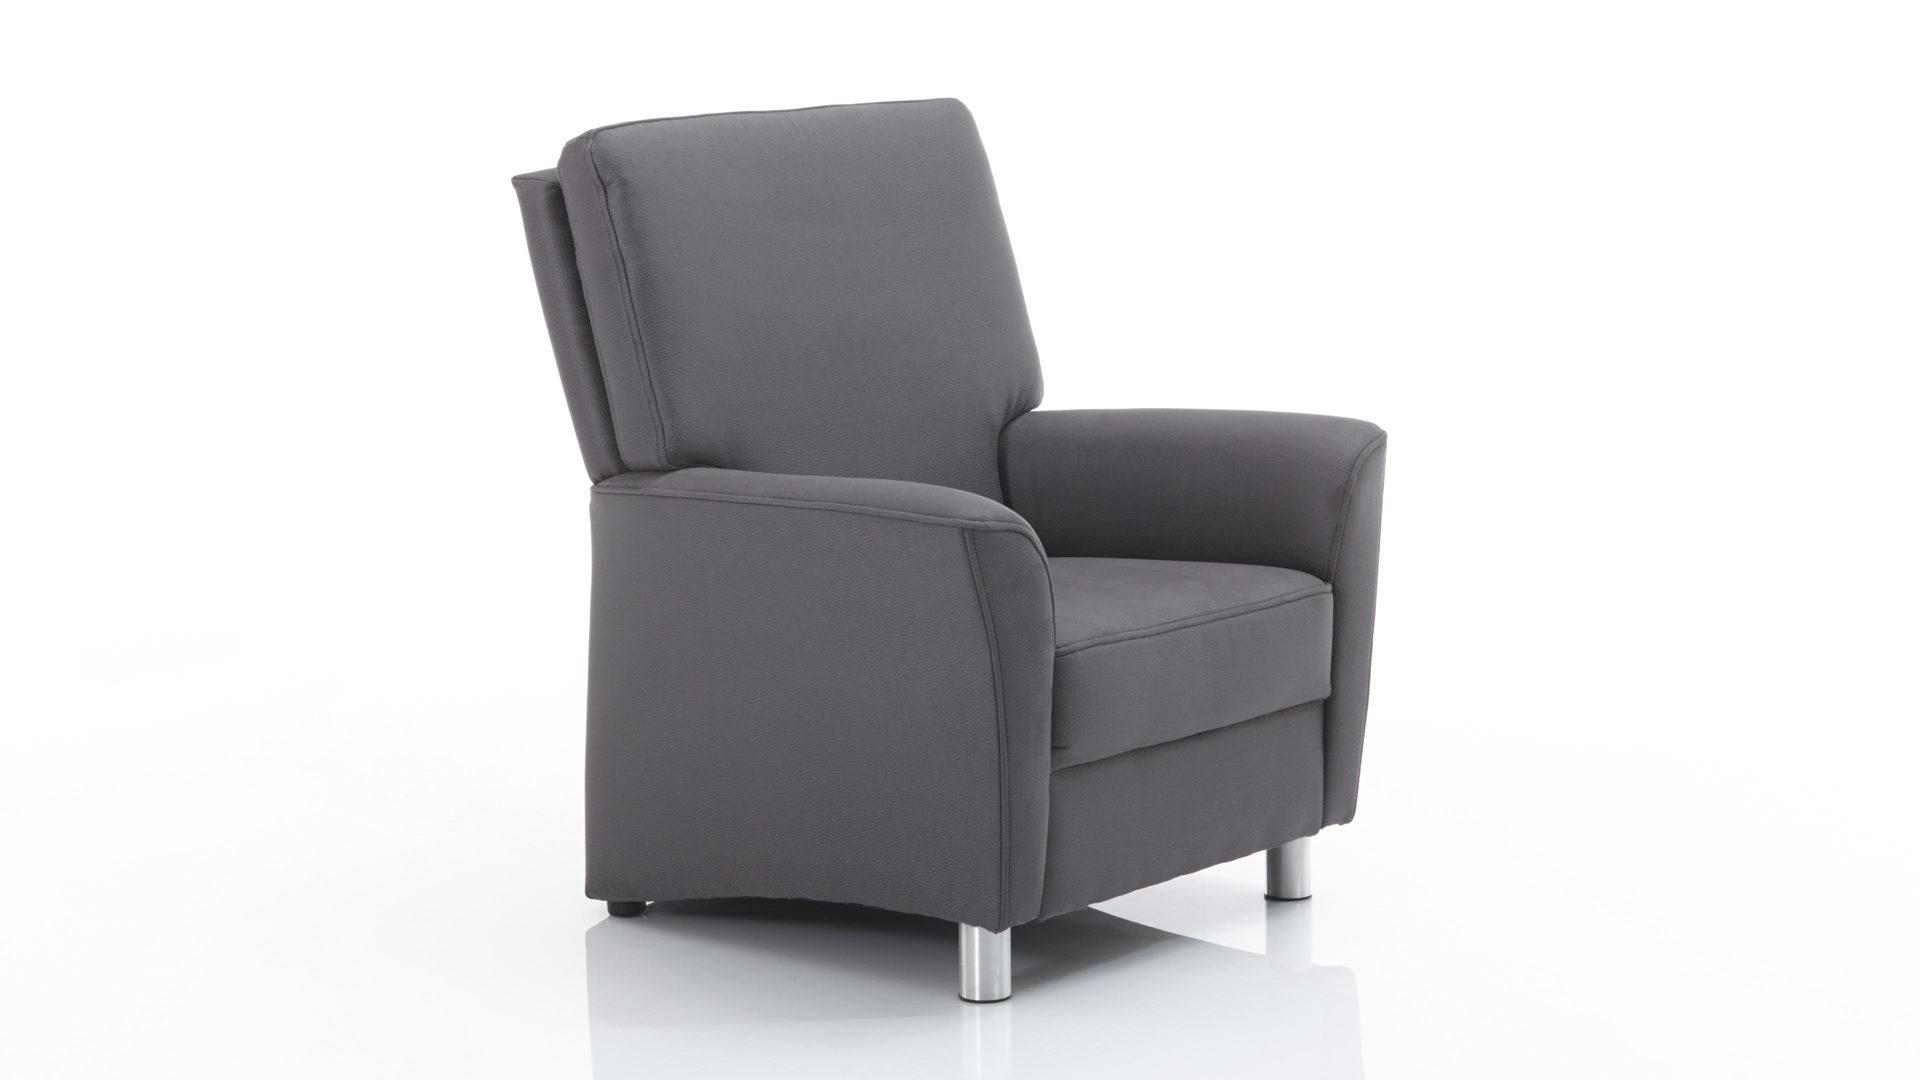 Wohnzimmer Sessel Modern wohnzimmer sessel modern Hertel Mbel Gesees Rume Wohnzimmer Sessel Hocker Moderner Sessel In